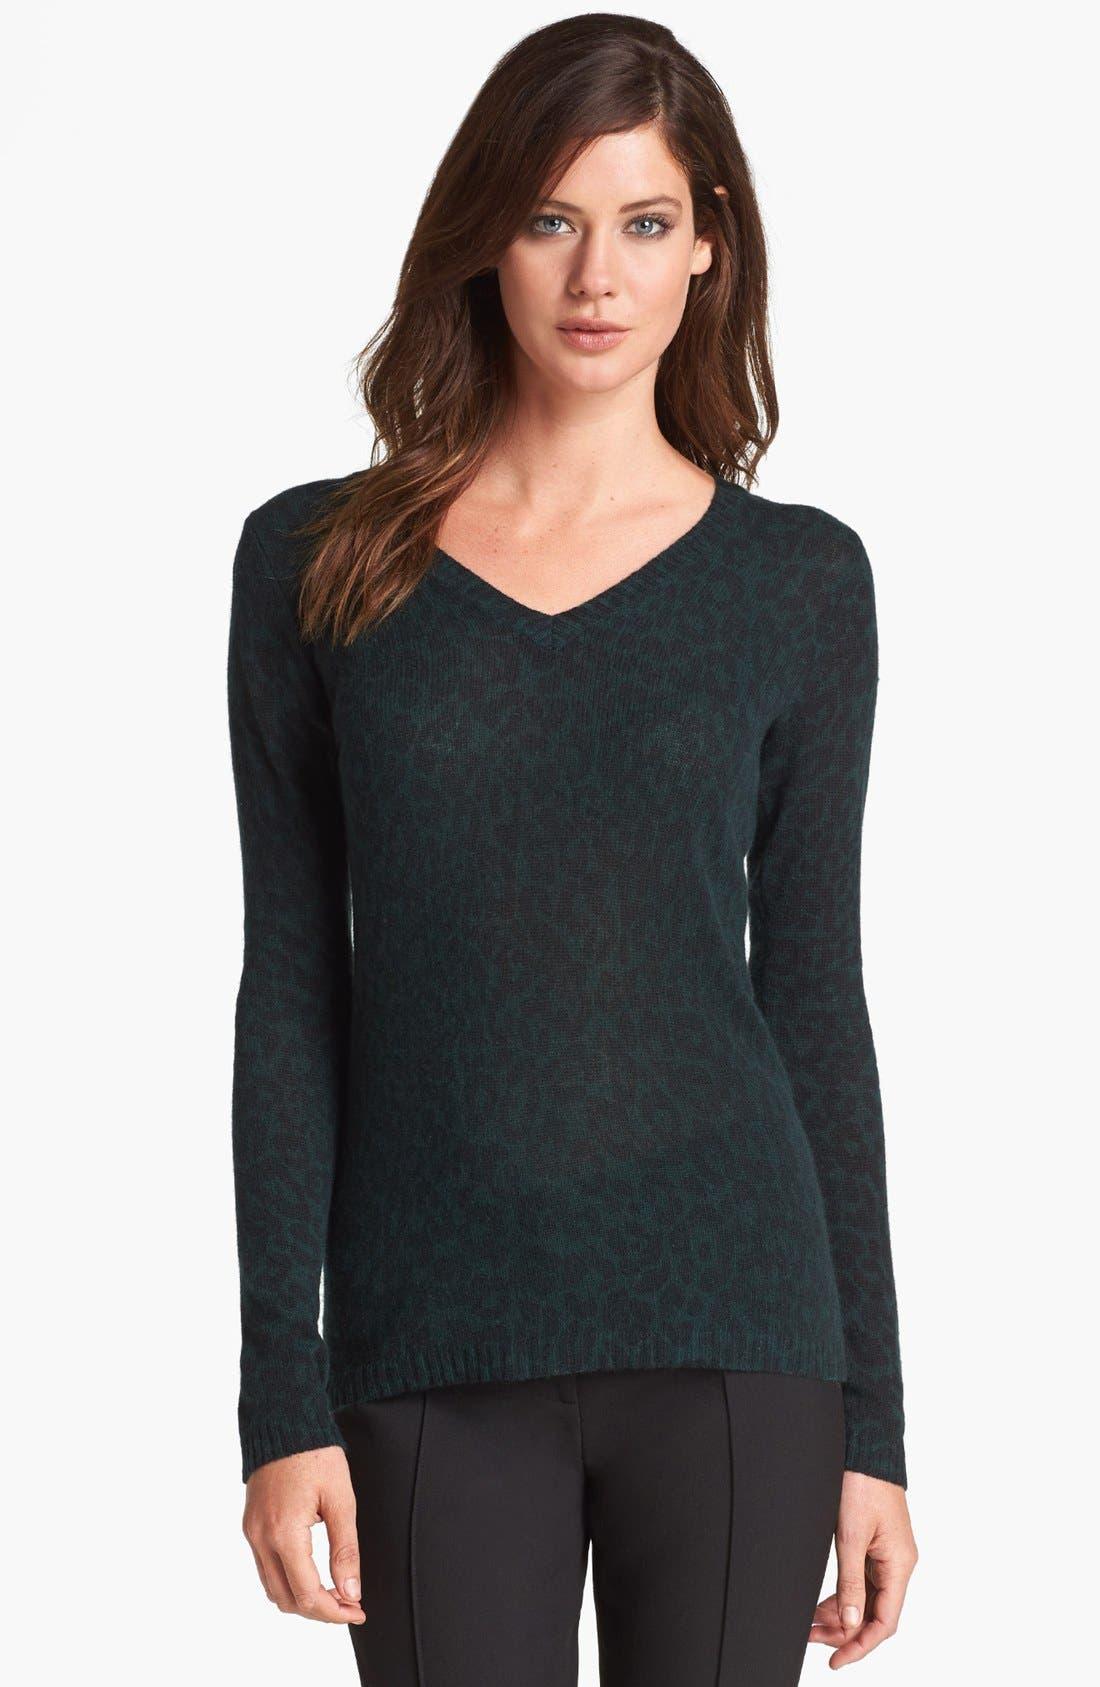 Alternate Image 1 Selected - White + Warren Print V-Neck Cashmere Sweater